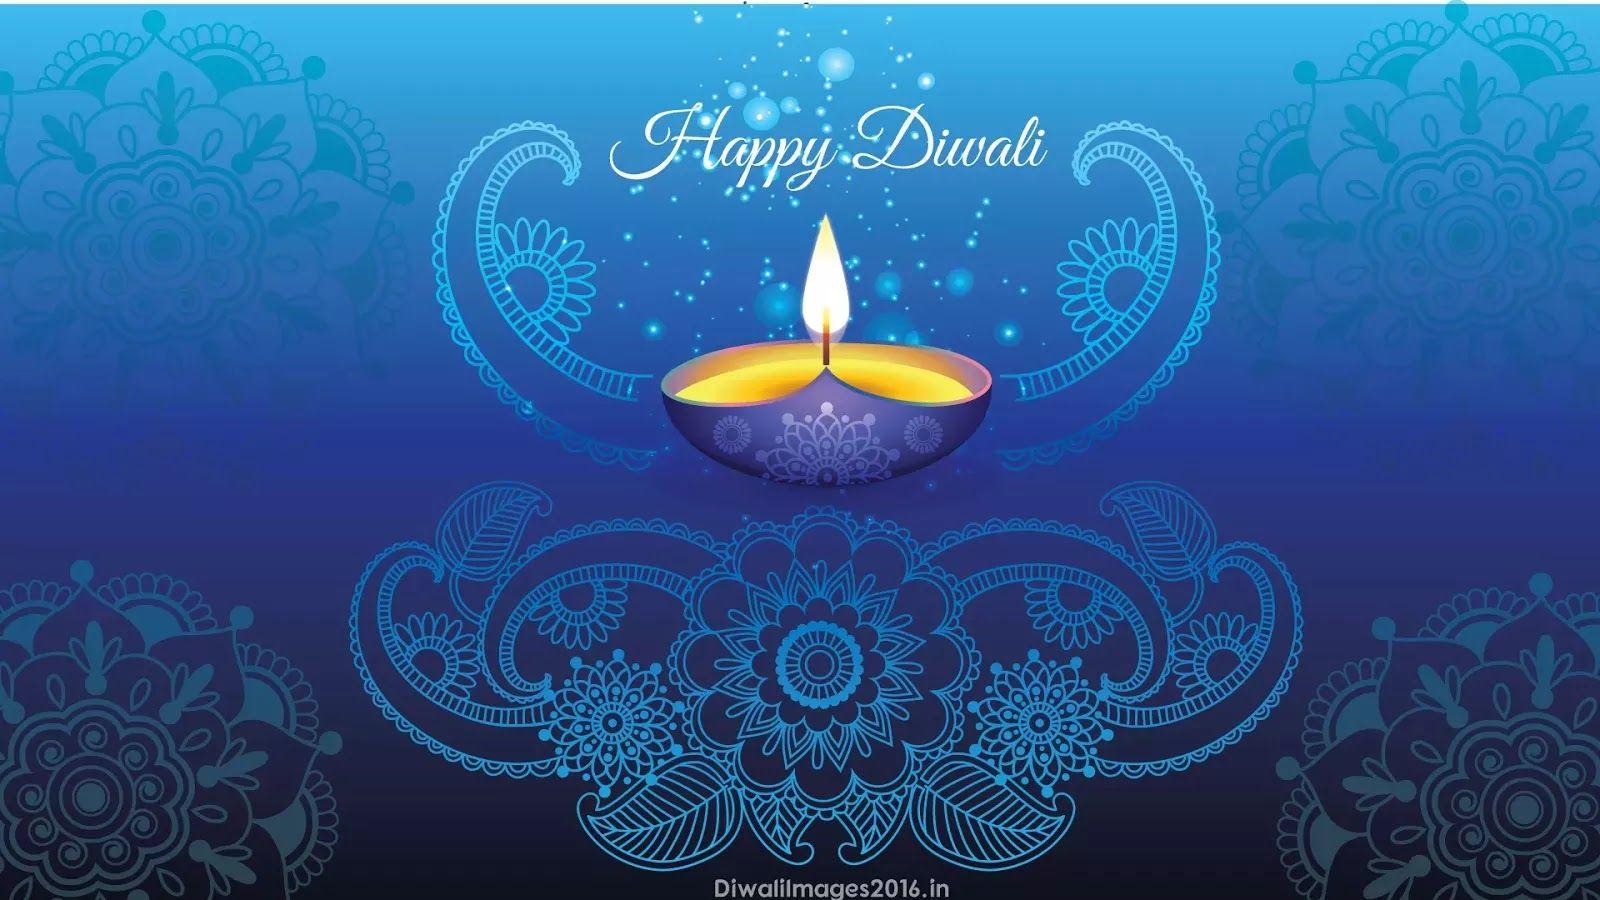 Beautiful Happy Diwali Images 2016 Happy Diwali 2016 Happy